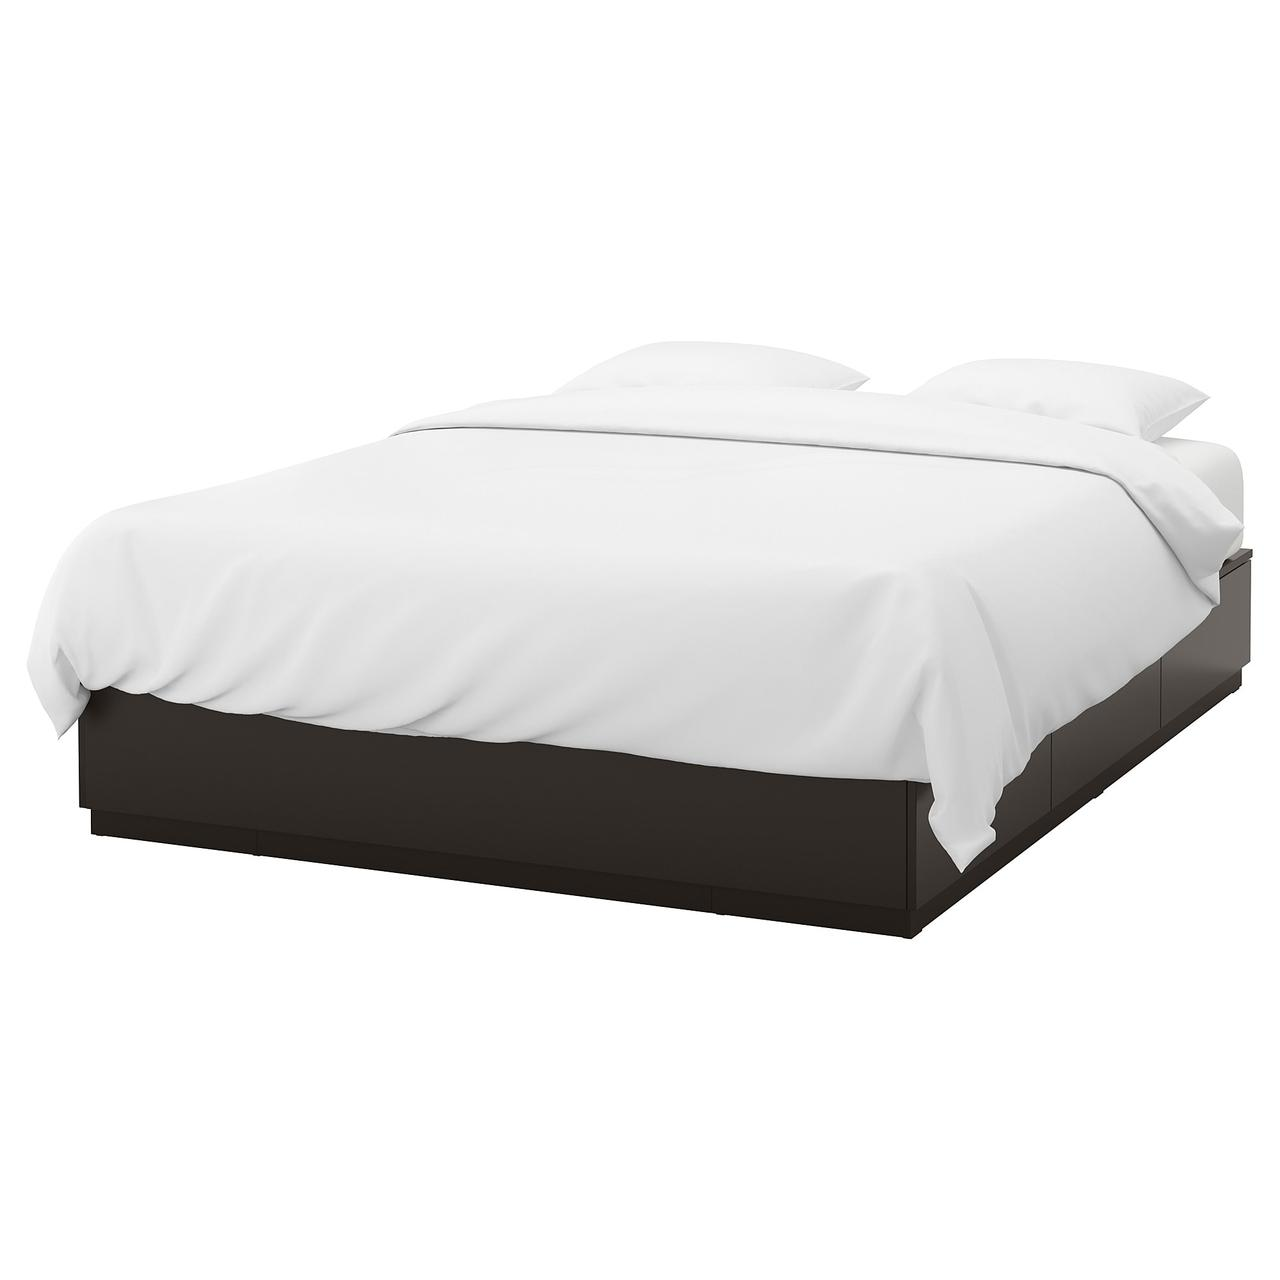 НОРДЛИ Каркас кровати с ящиками, антрацит